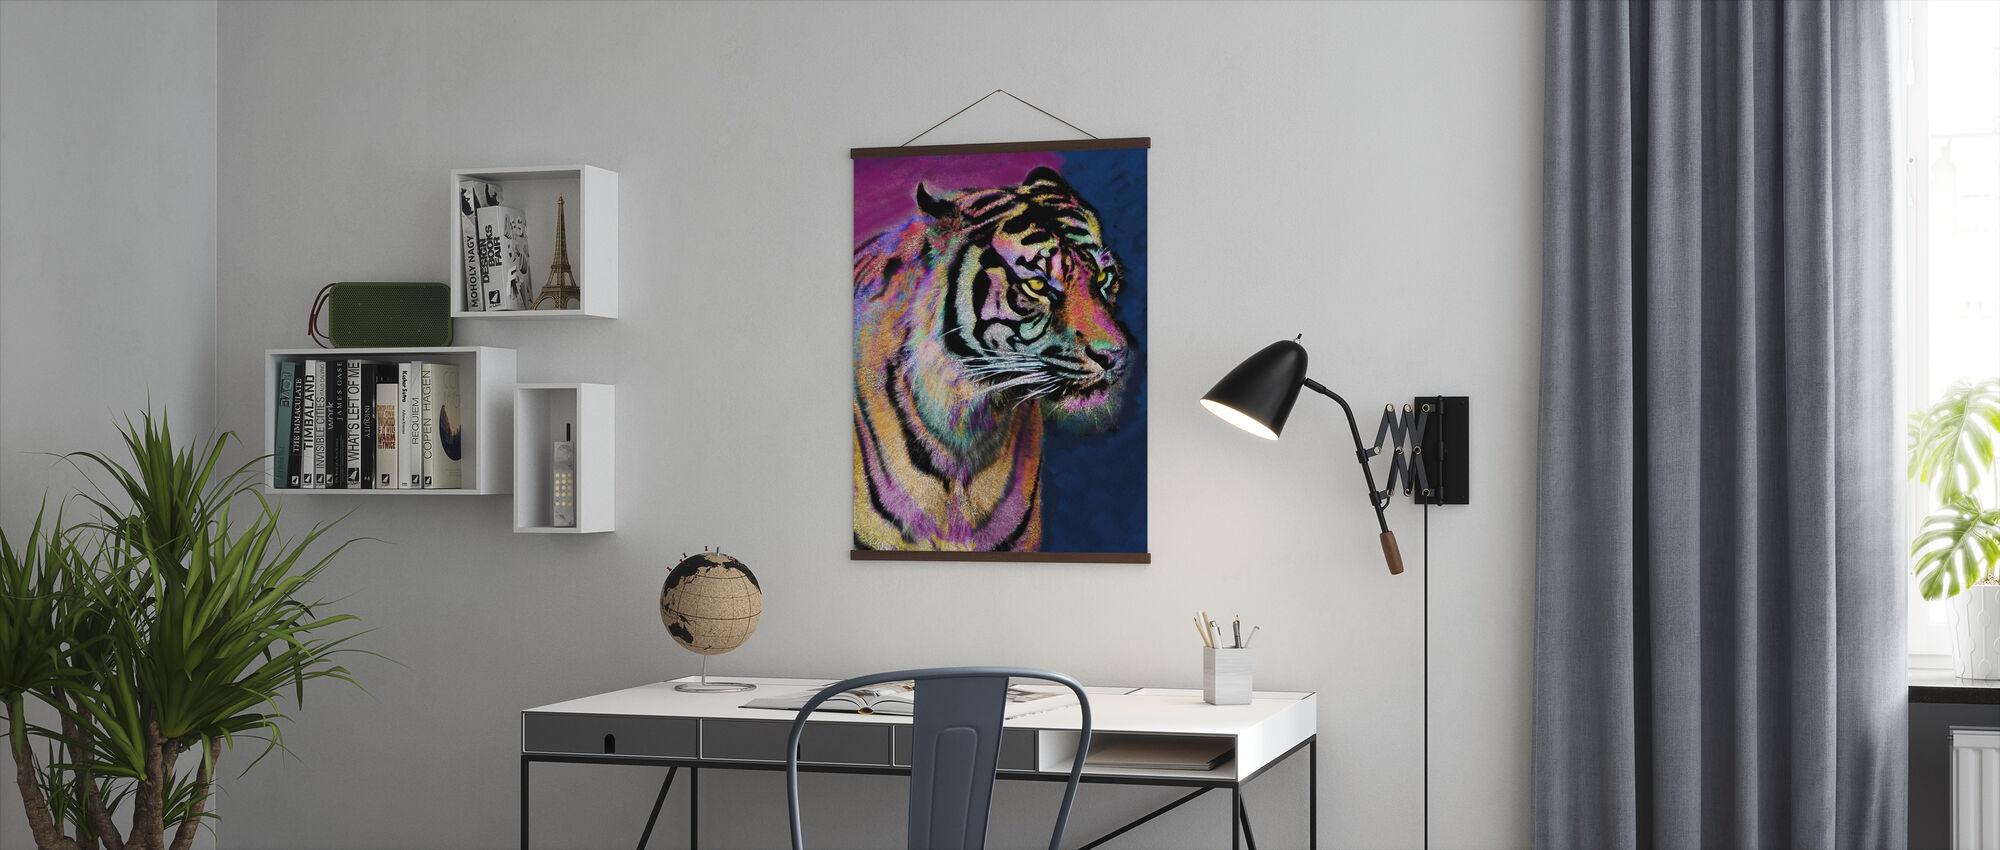 Rainbow Tiger - Plakat - Kontor